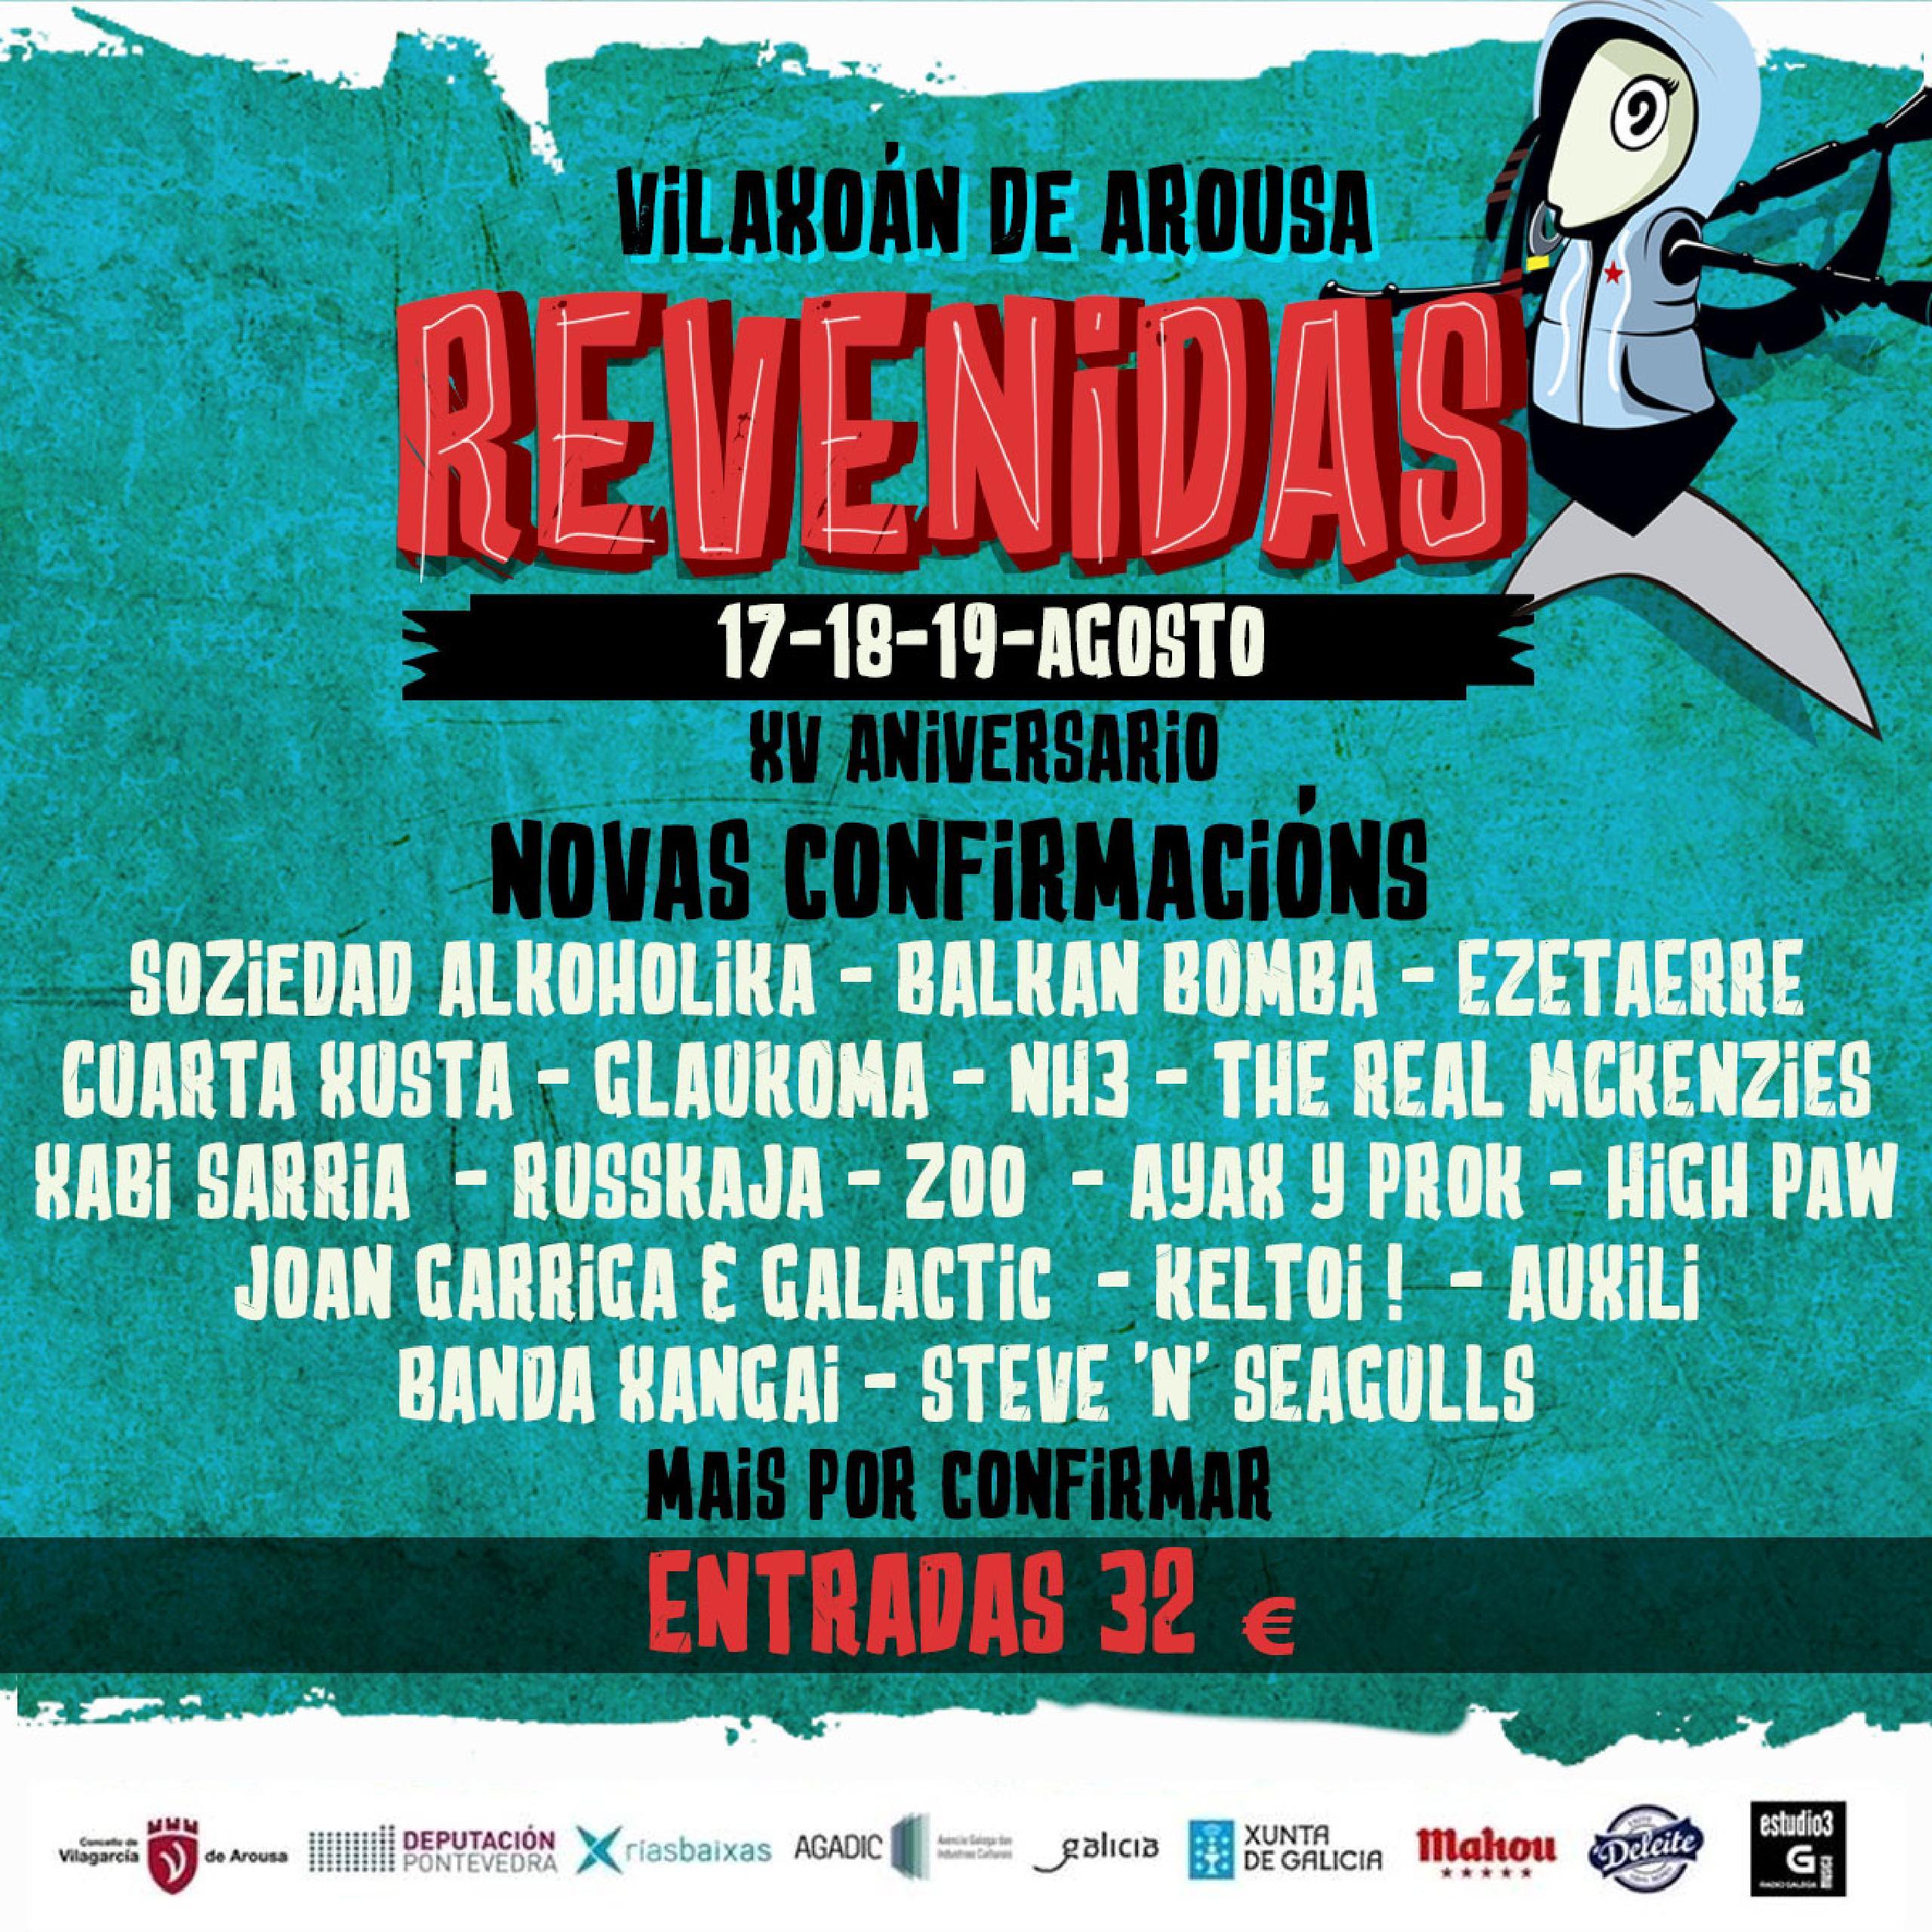 Cartel del festival Revenidas 2018